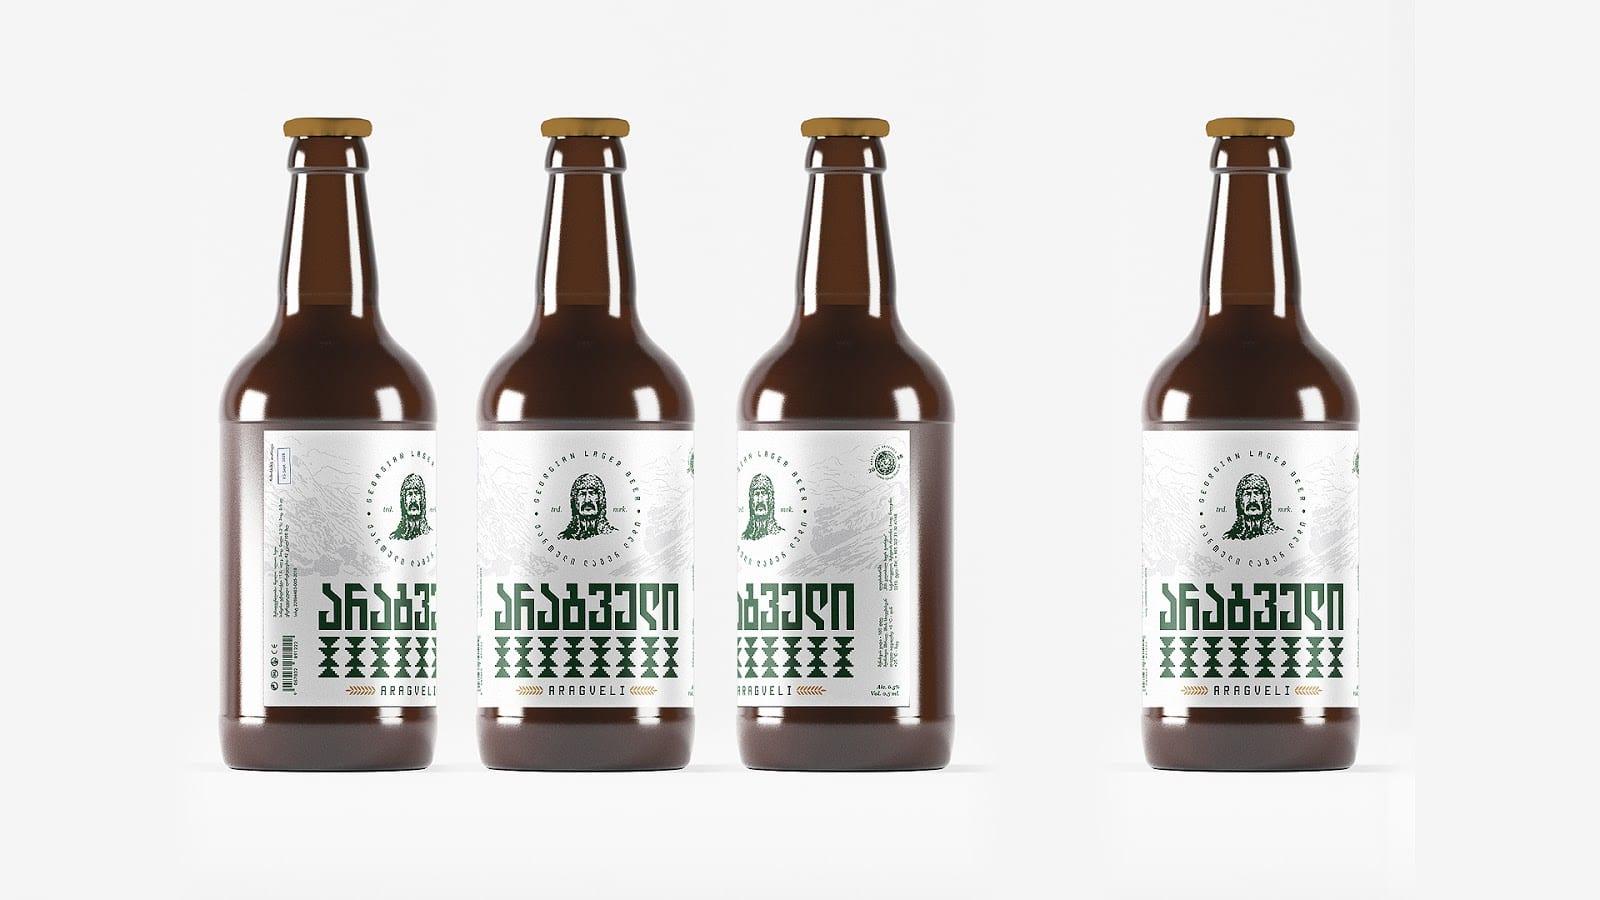 8 Simulation - Odvážná podoba piva Aragveli